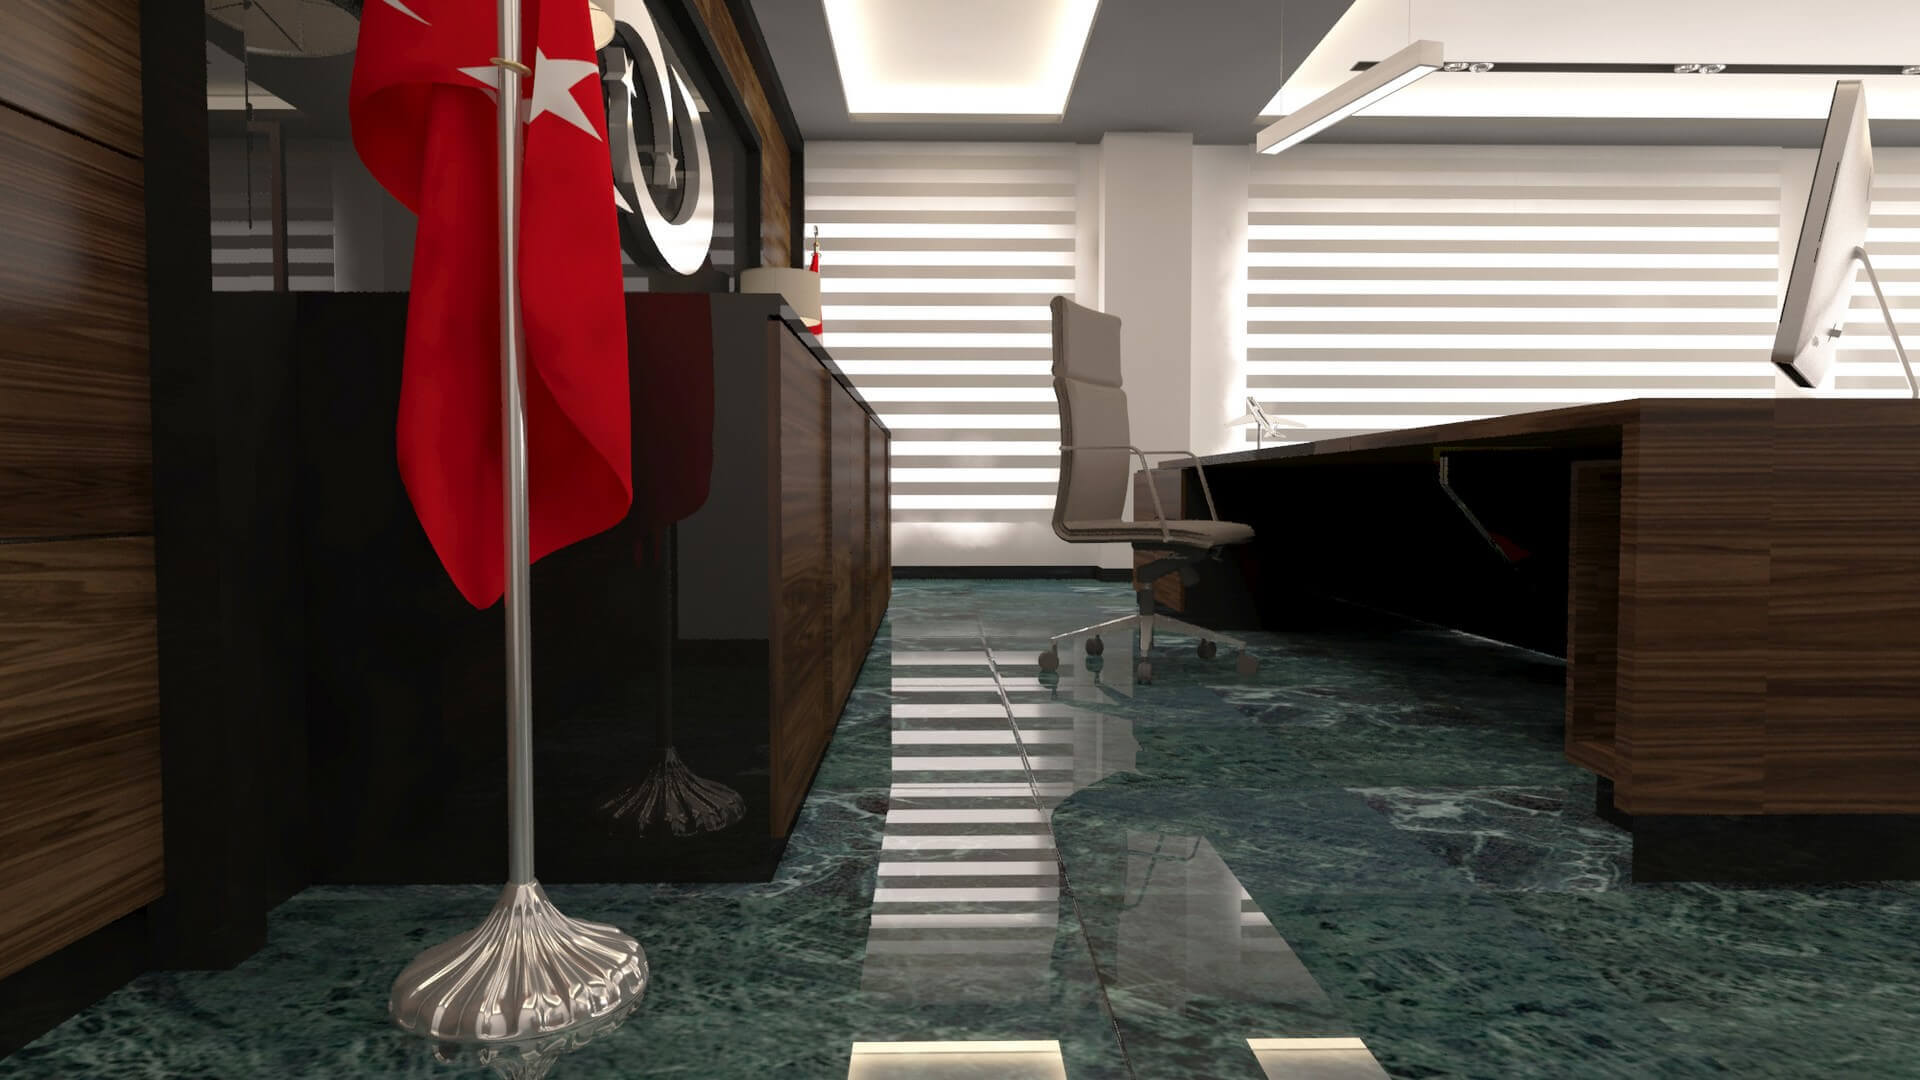 Akyurt 2719 Turk Ilac Office Building Offices